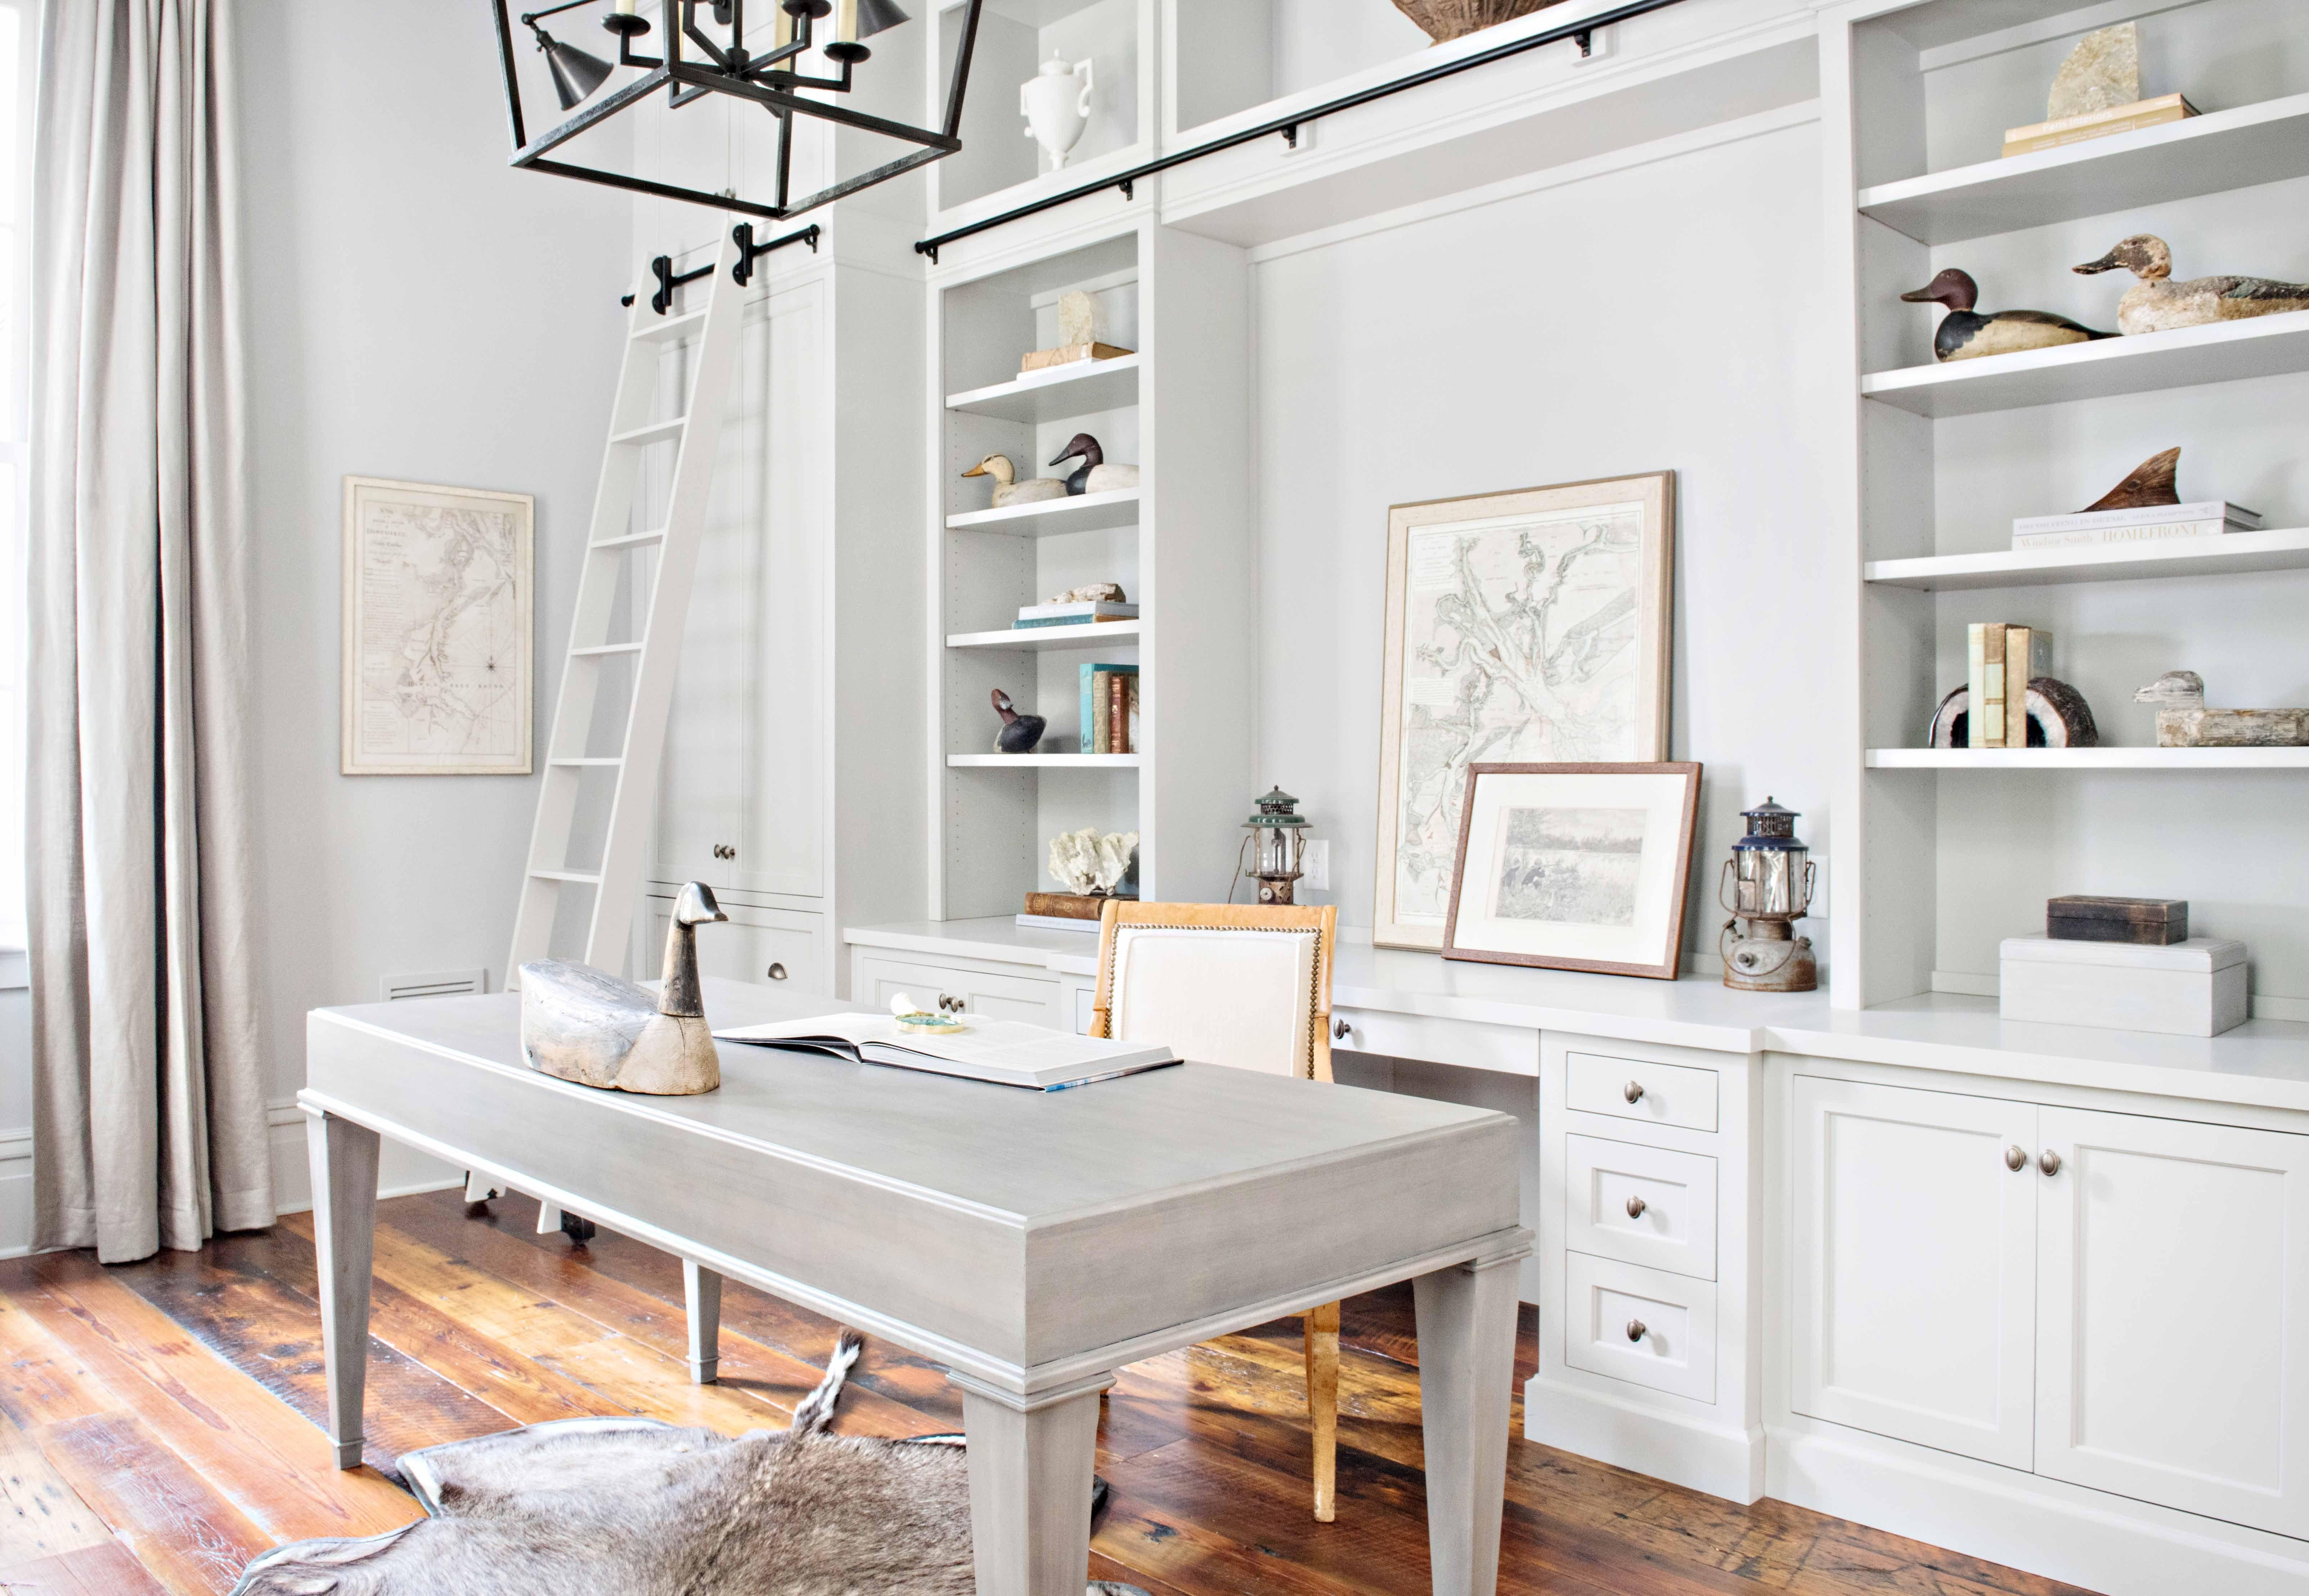 Southern Home Decor Inspiration | Baileys, Design inspiration and ...